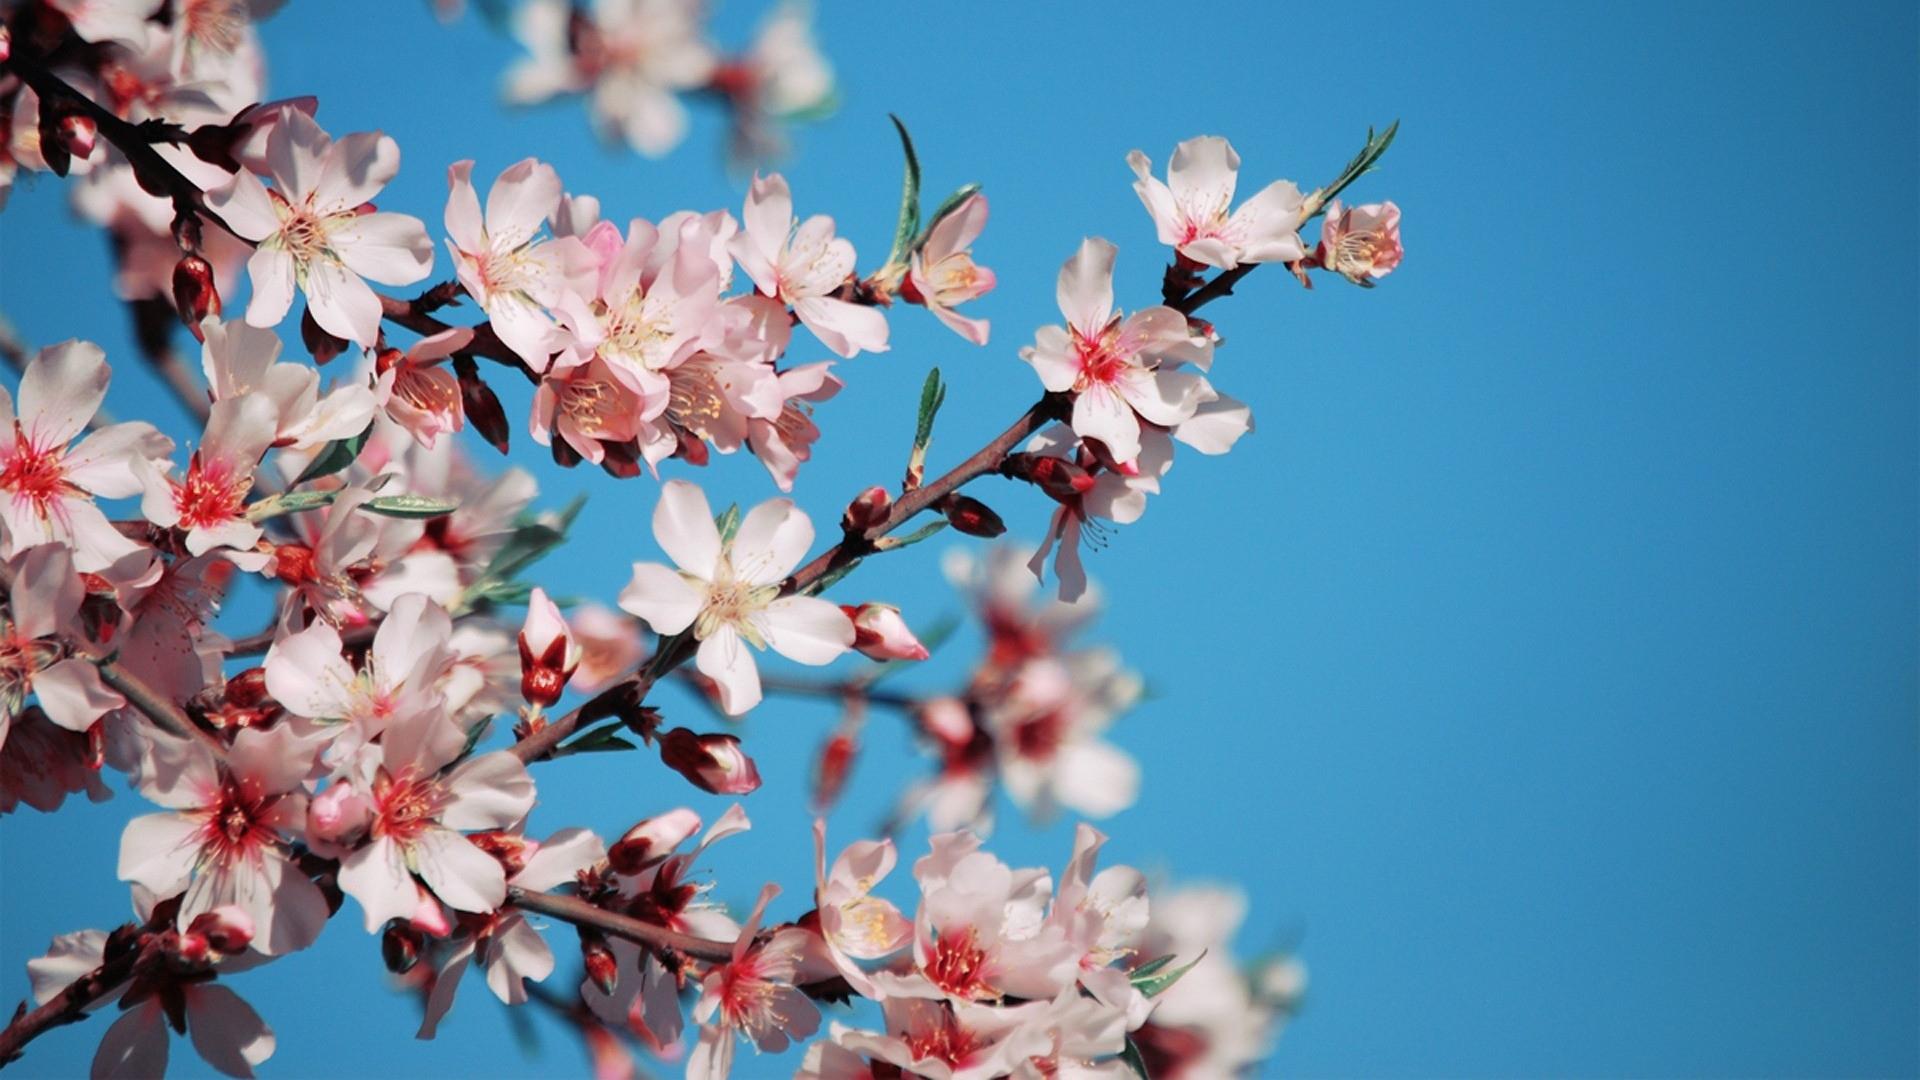 Download wallpaper 1920x1080 blossom flower pink bright blue blossom flower pink mightylinksfo